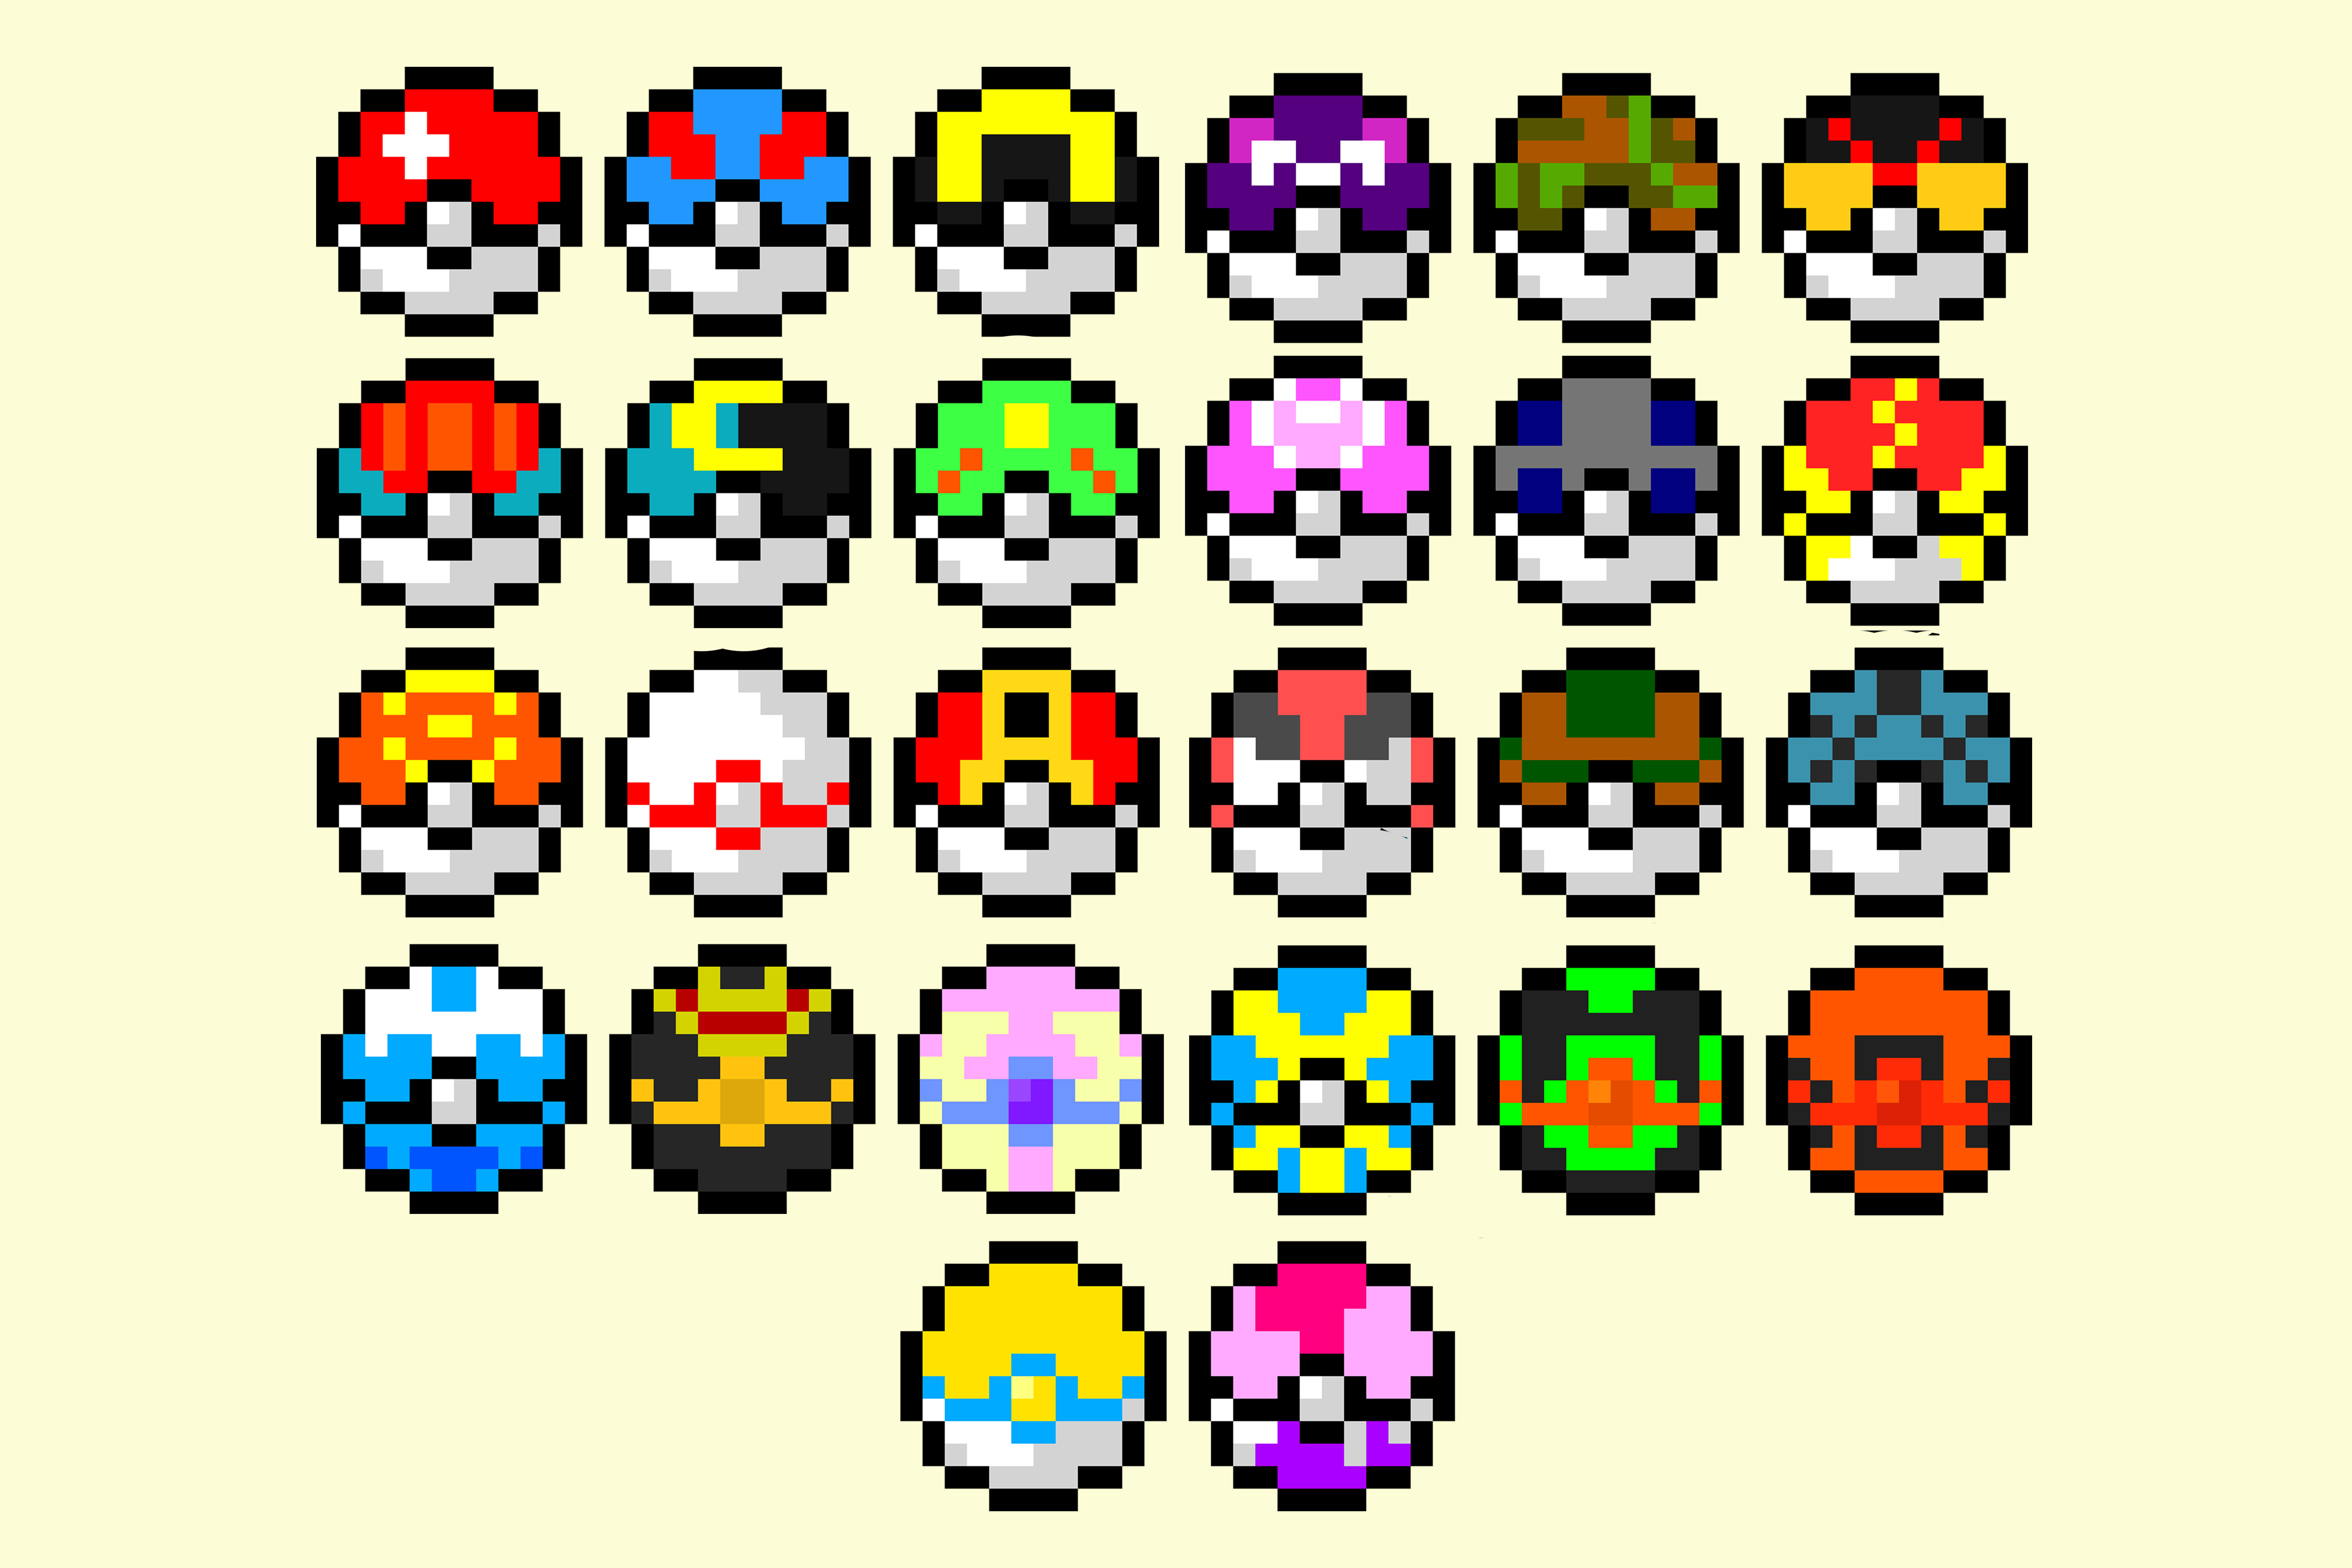 Minecraft Pixel Art Grid Easy Pokemon